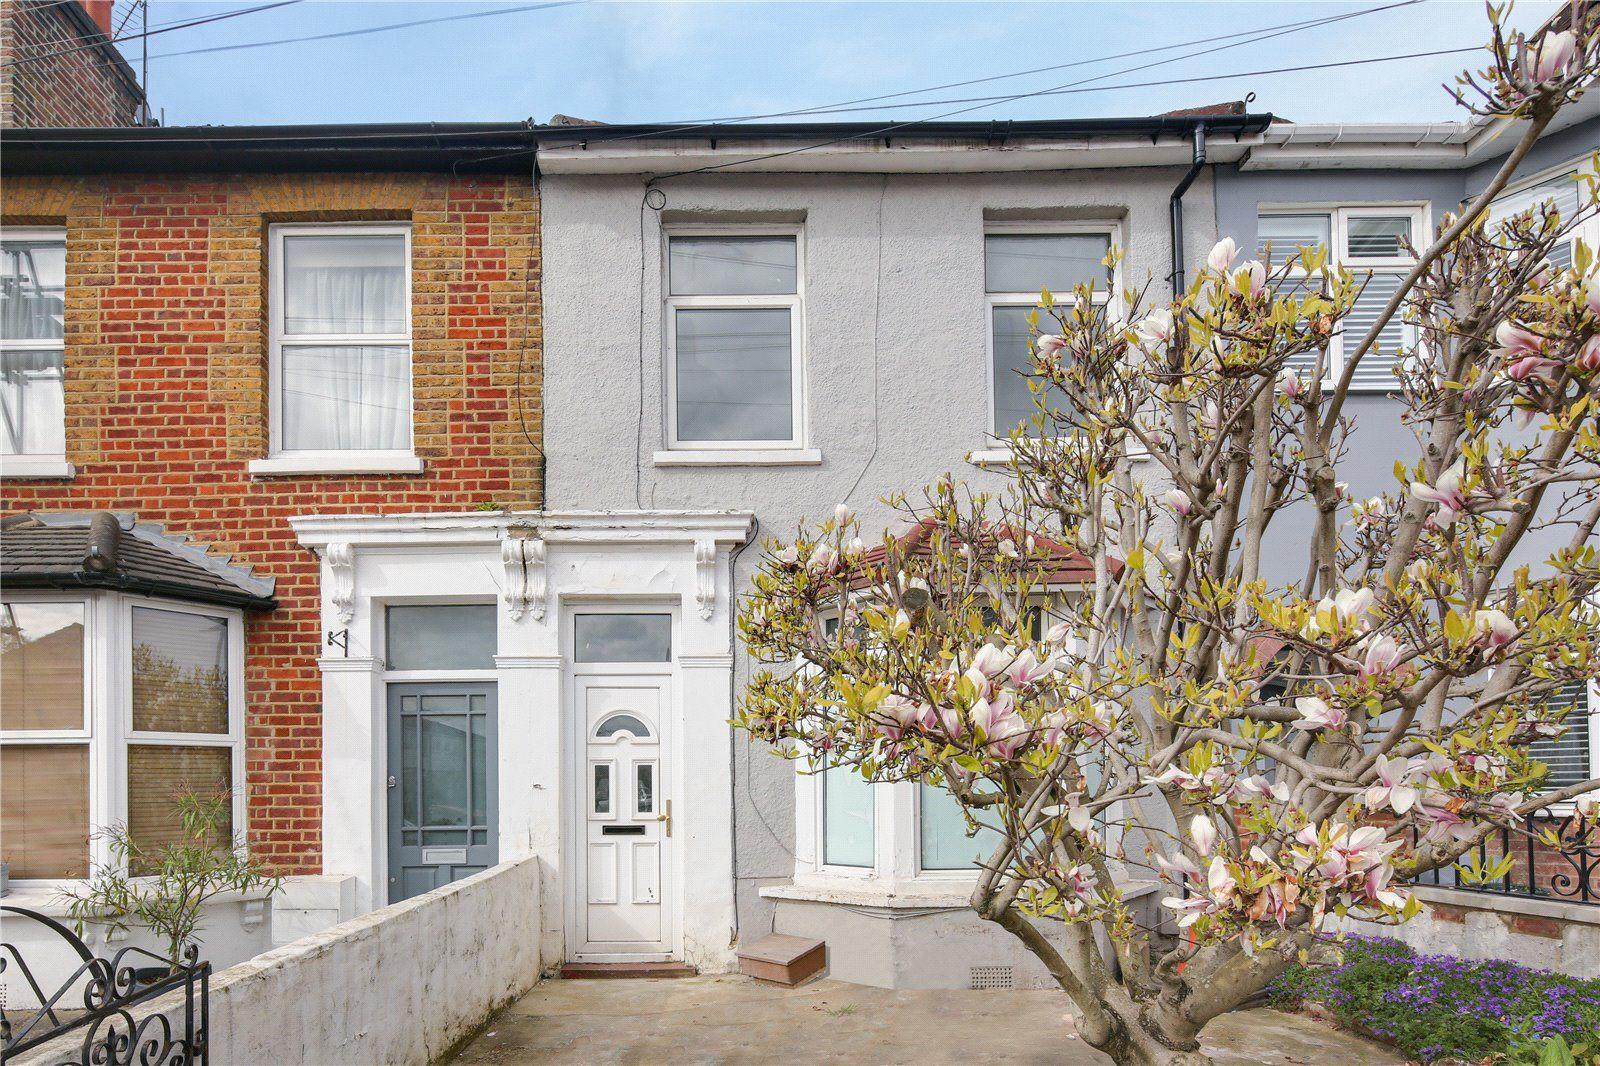 Property photo 1 of 20. Exterior